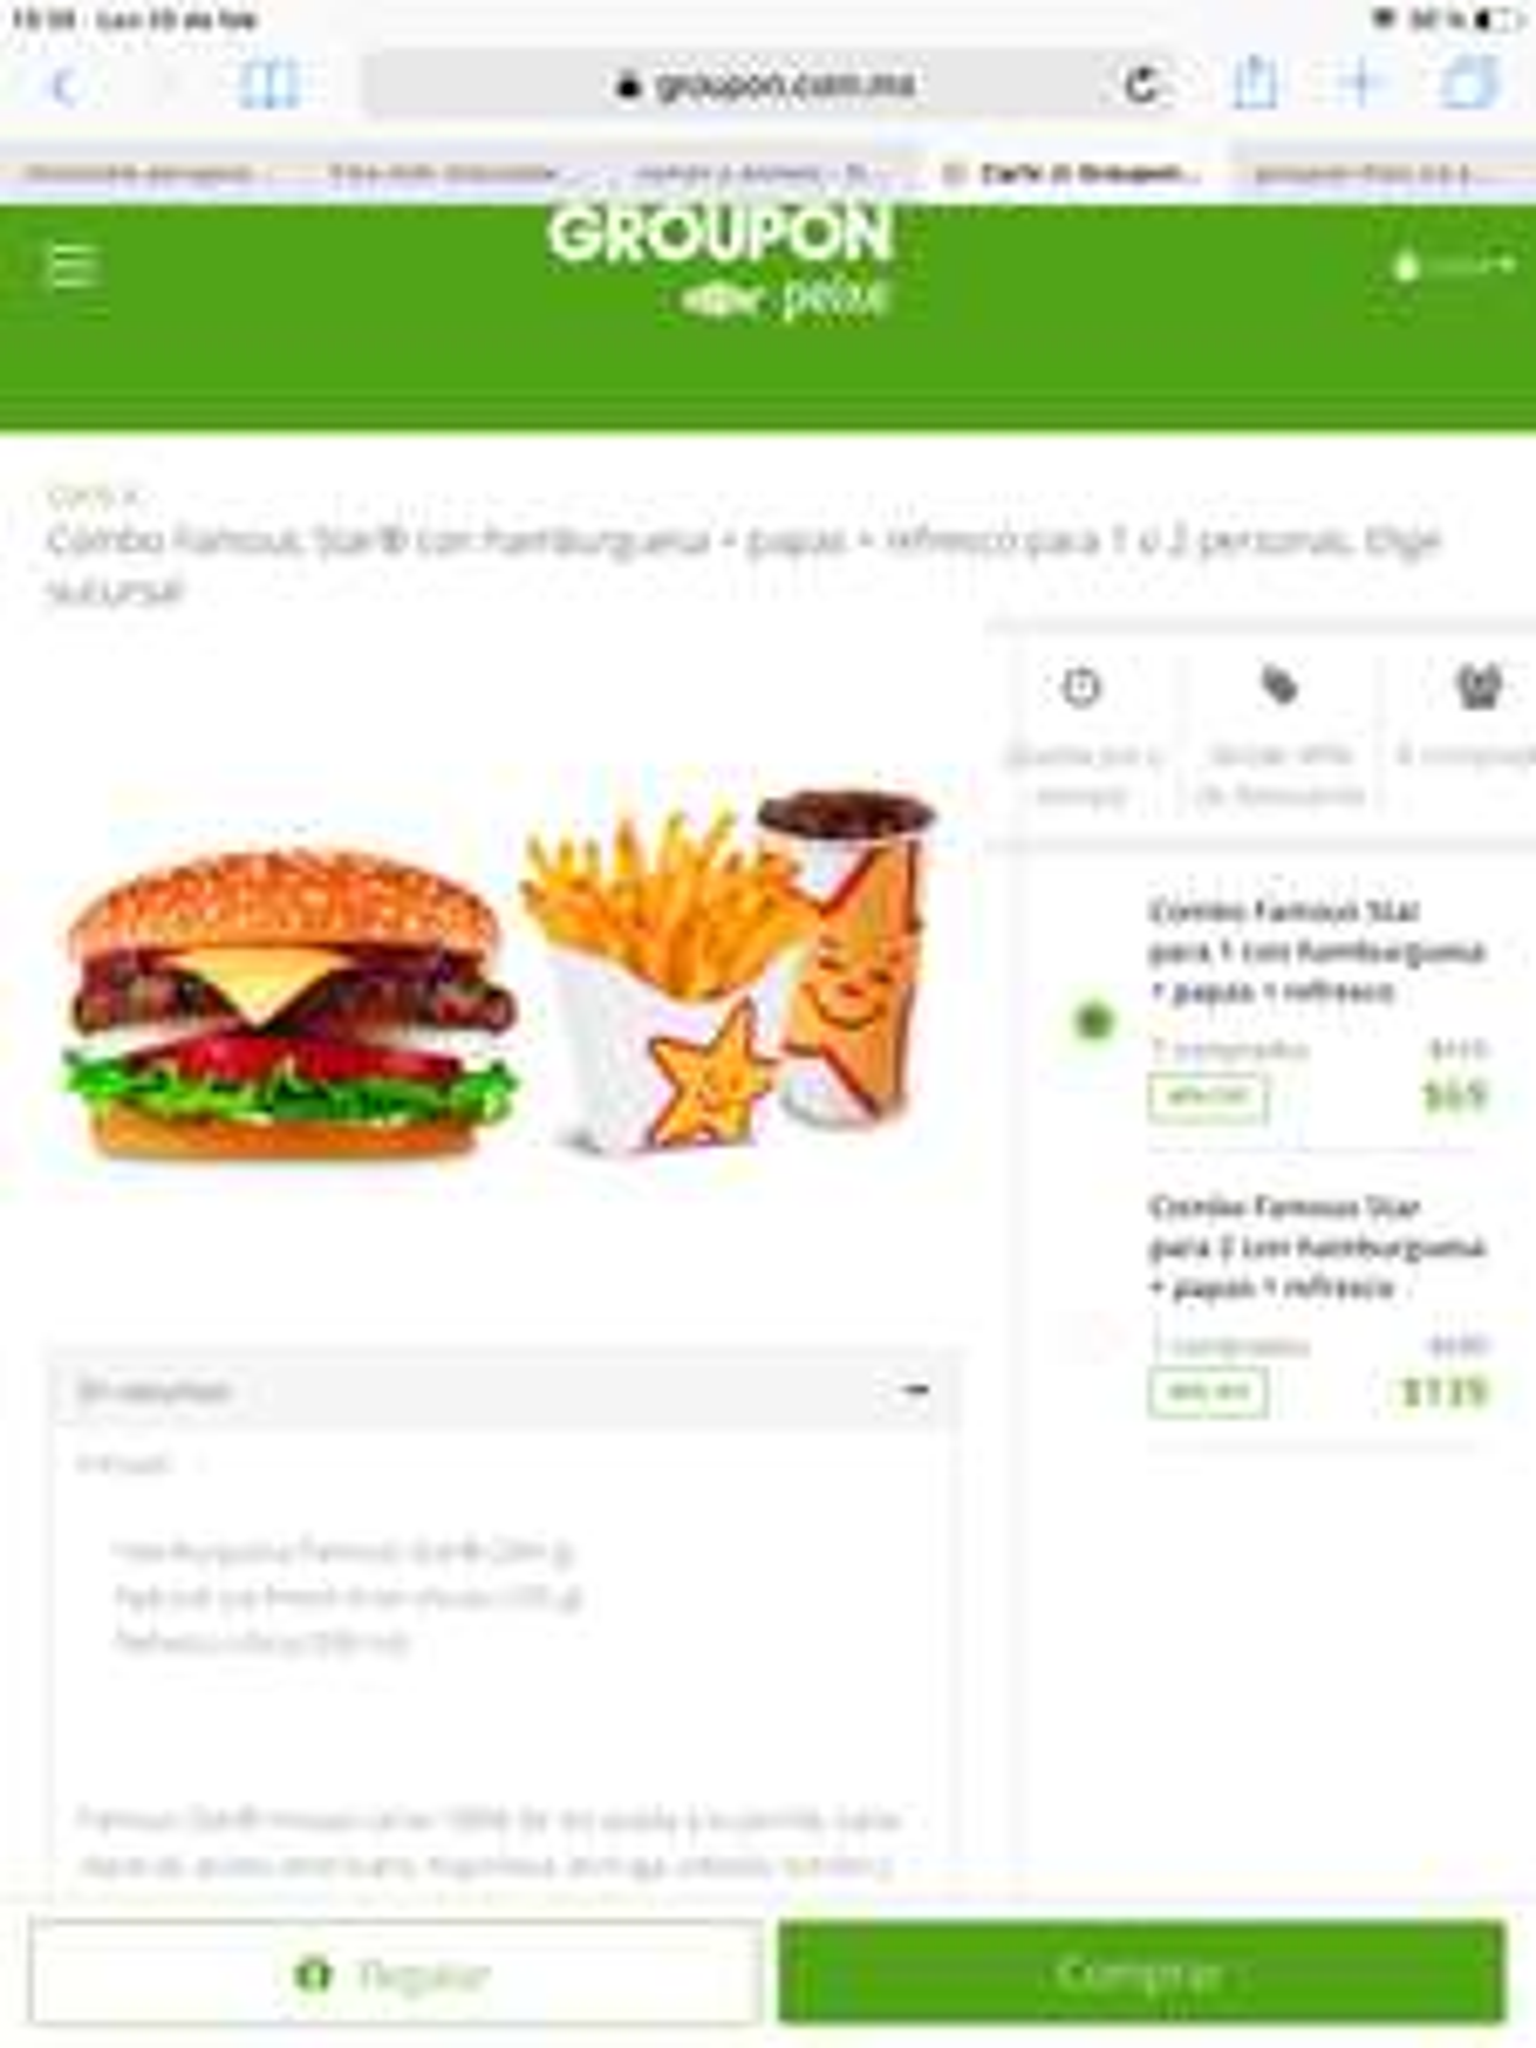 Groupon: Carls J Combo Famous Star con hamburguesa + papas + refresco (Sólo CDMX y EDOMEX)